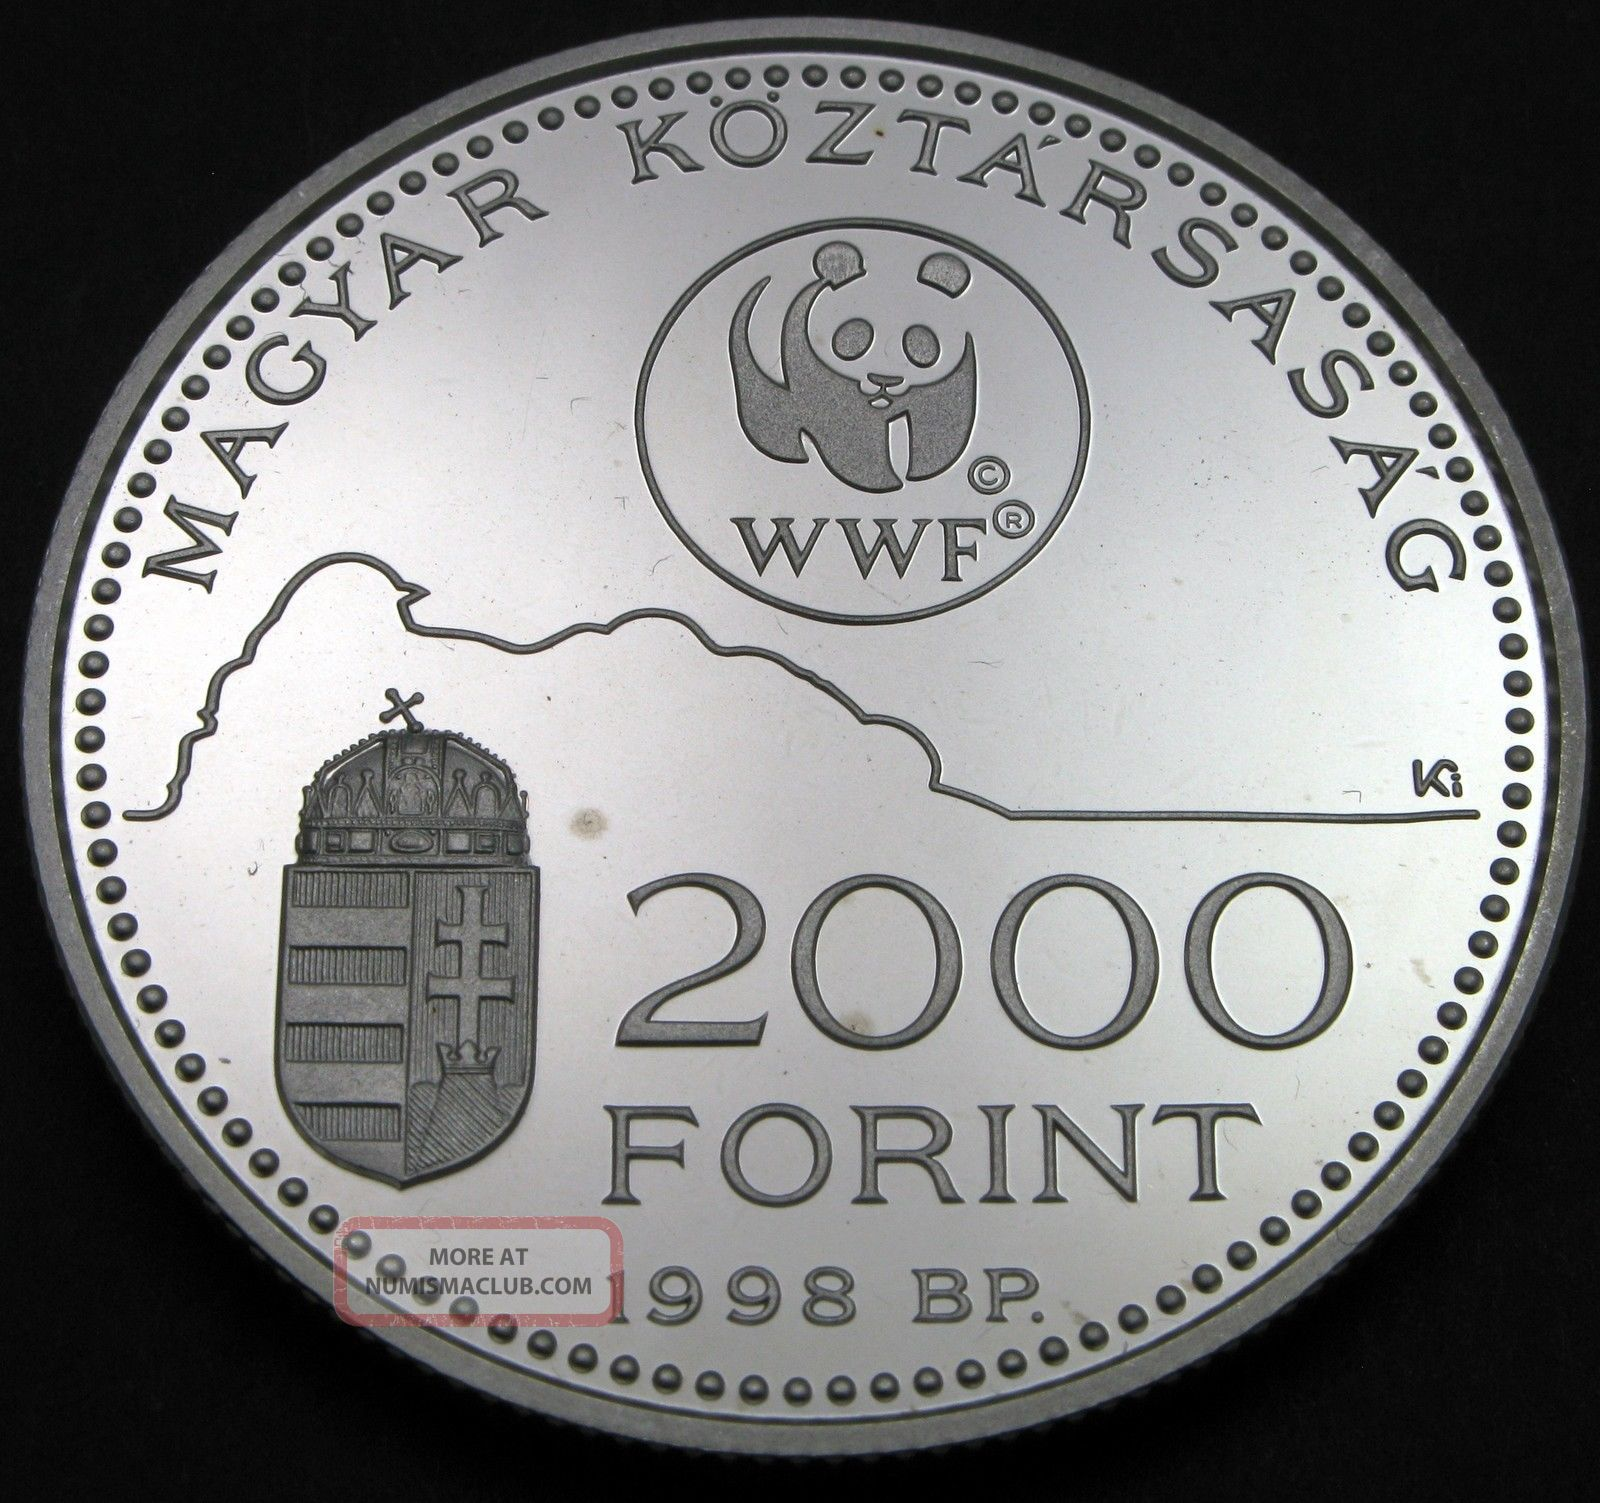 Hungary 2000 Forint 1998 Proof - Silver - World Wildlife Fund - 607 猫 Europe photo